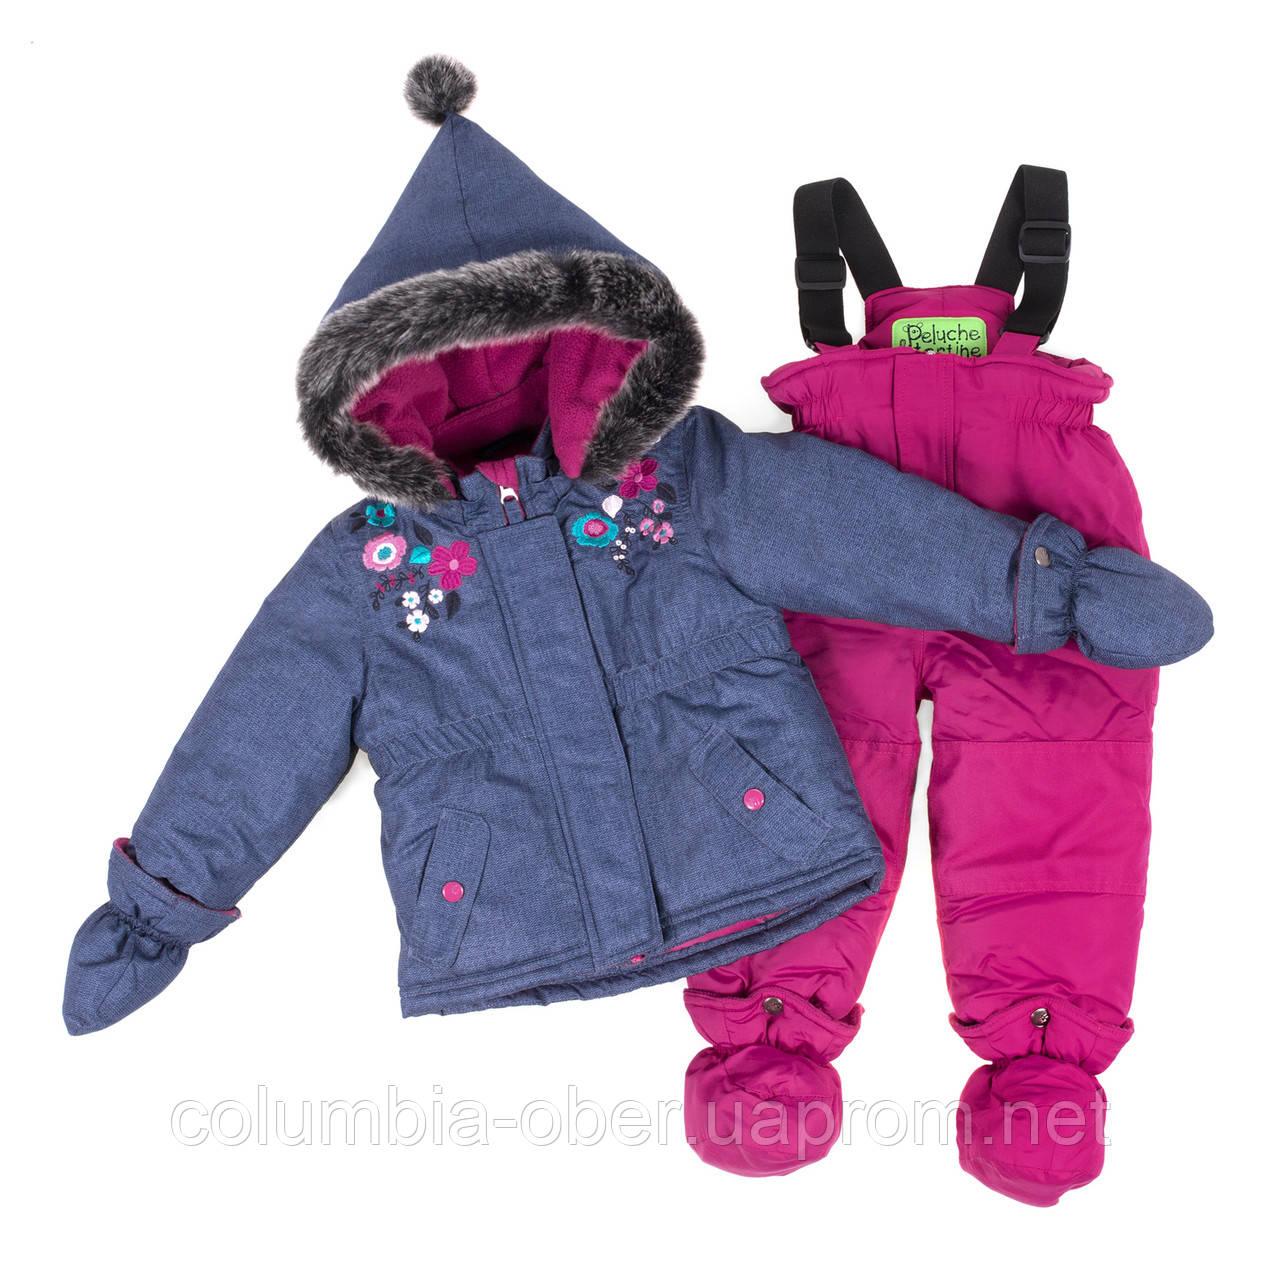 Зимний комплект для девочки PELUCHE F18 M 10 BF Dk Heaven. Размеры 12 мес-3.